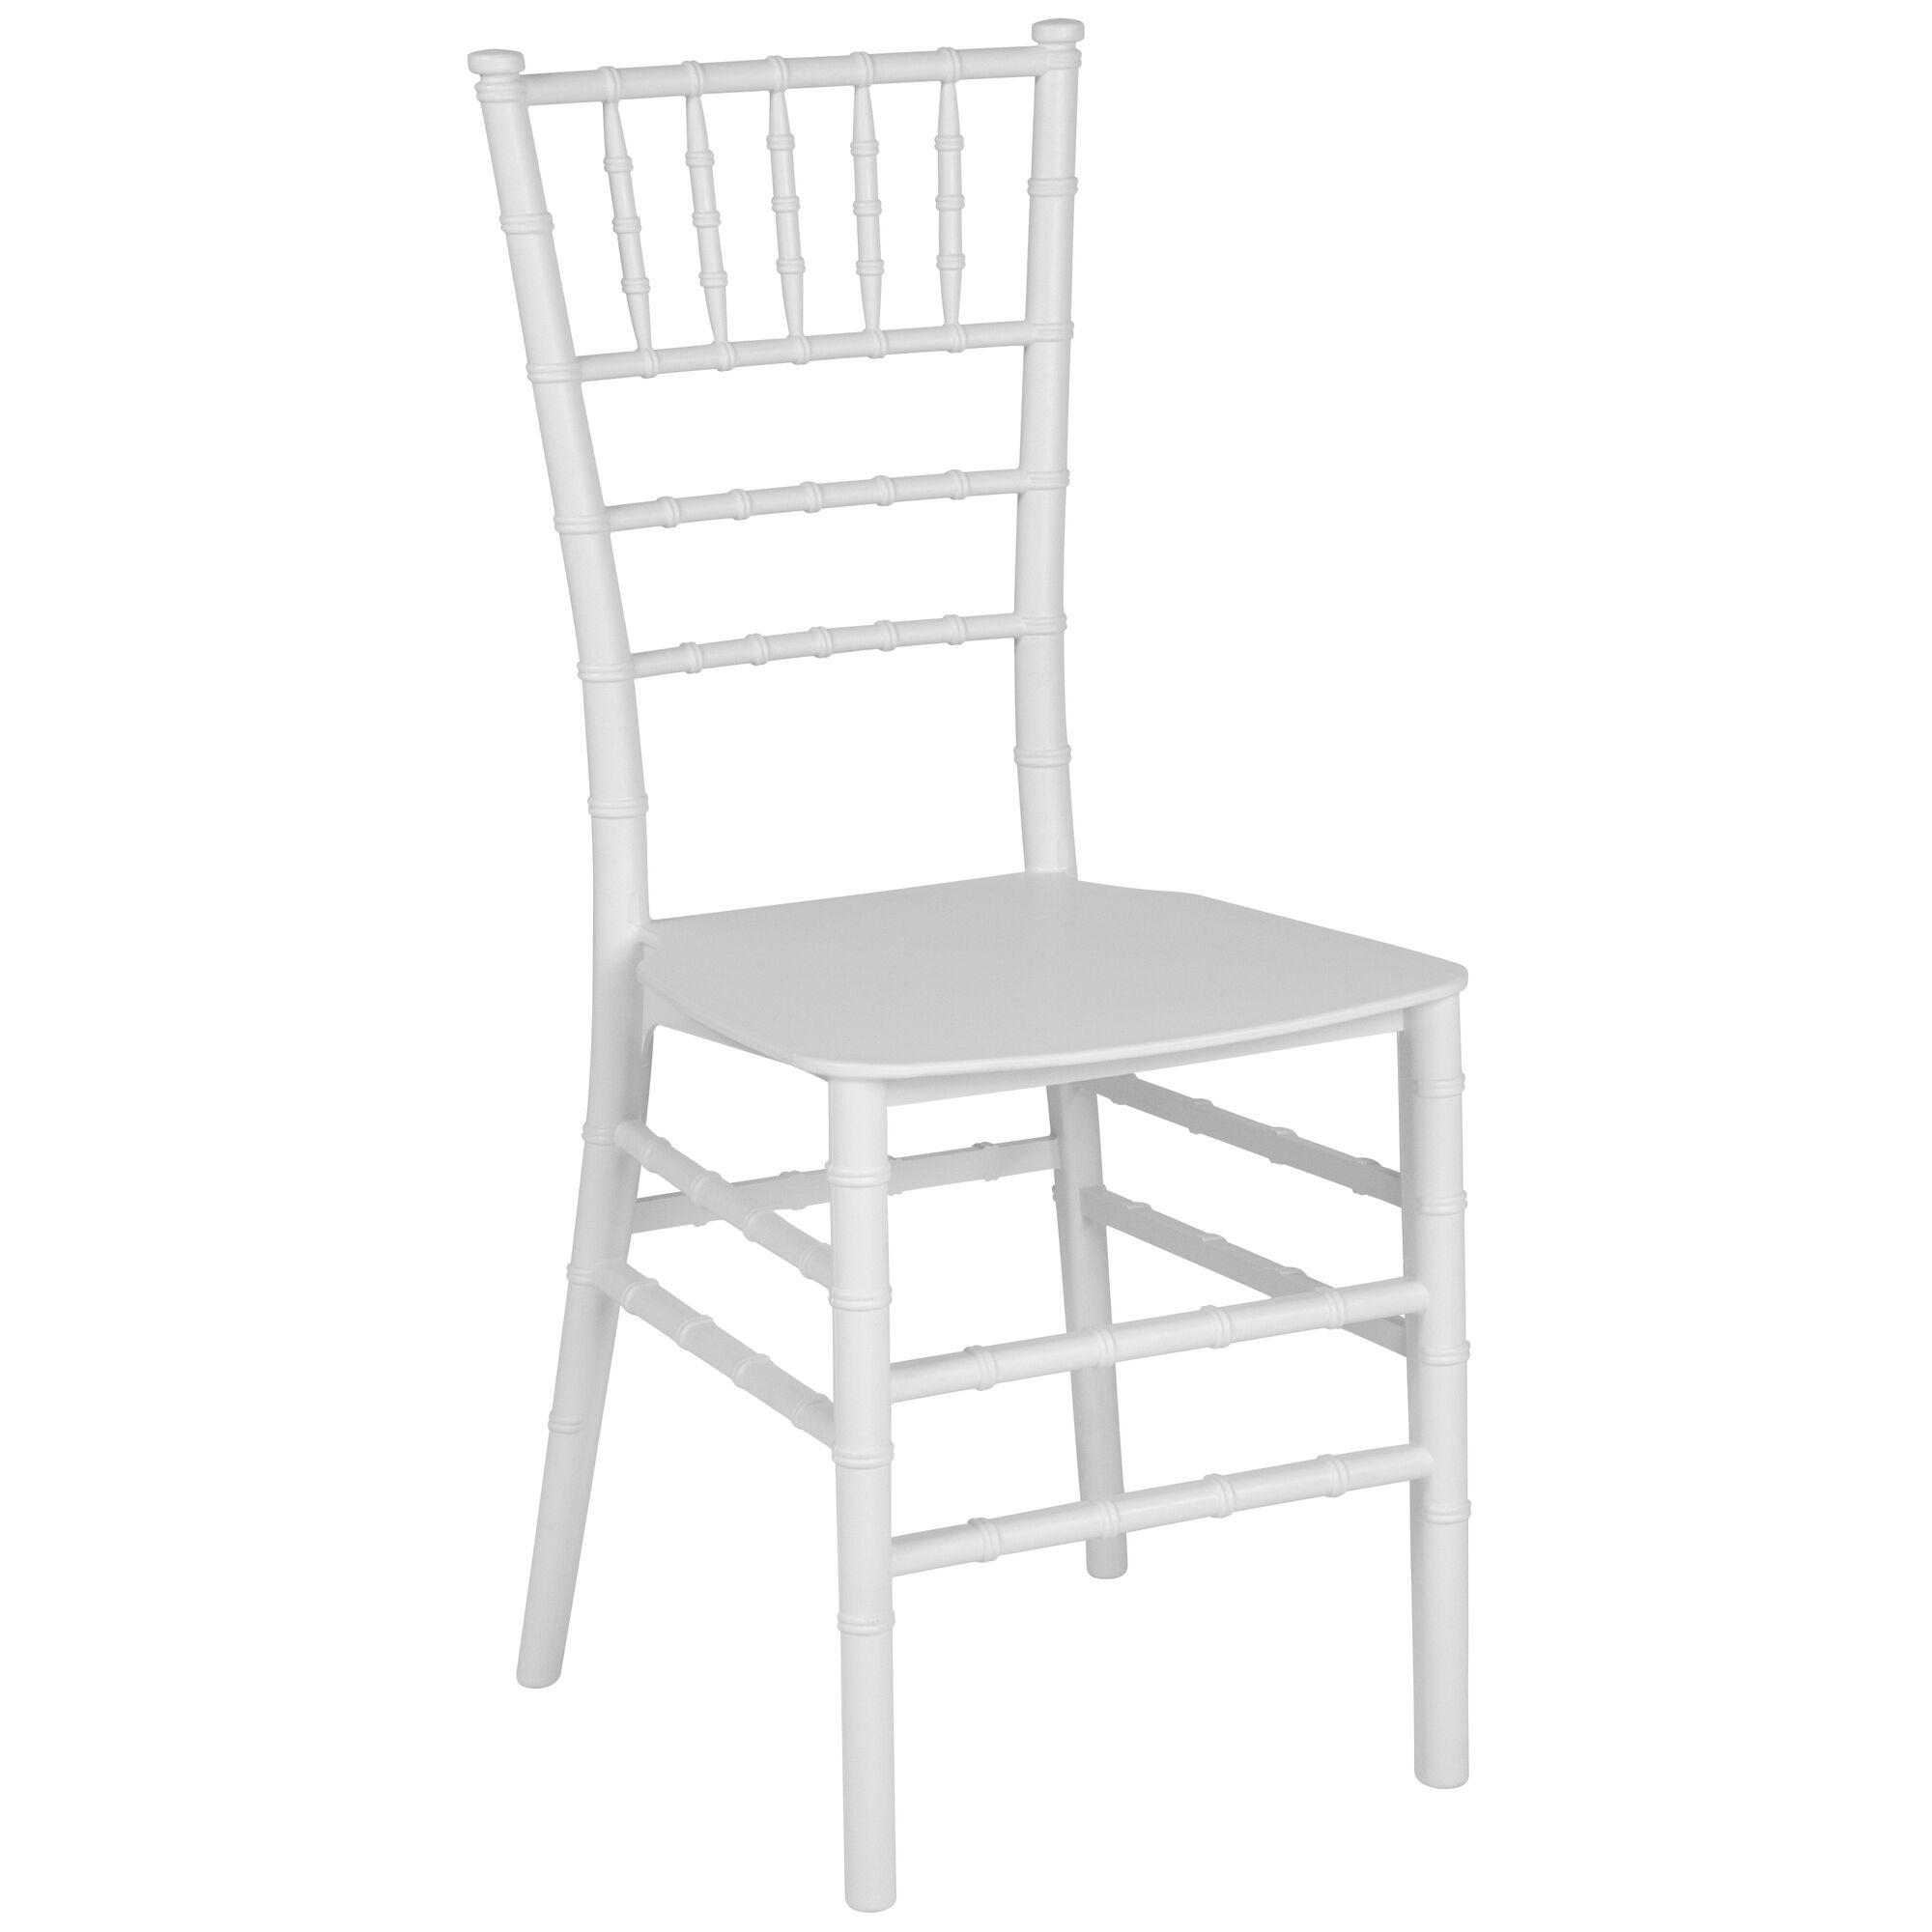 Swell Hercules Series White Resin Stacking Chiavari Chair With Free Cushion Creativecarmelina Interior Chair Design Creativecarmelinacom